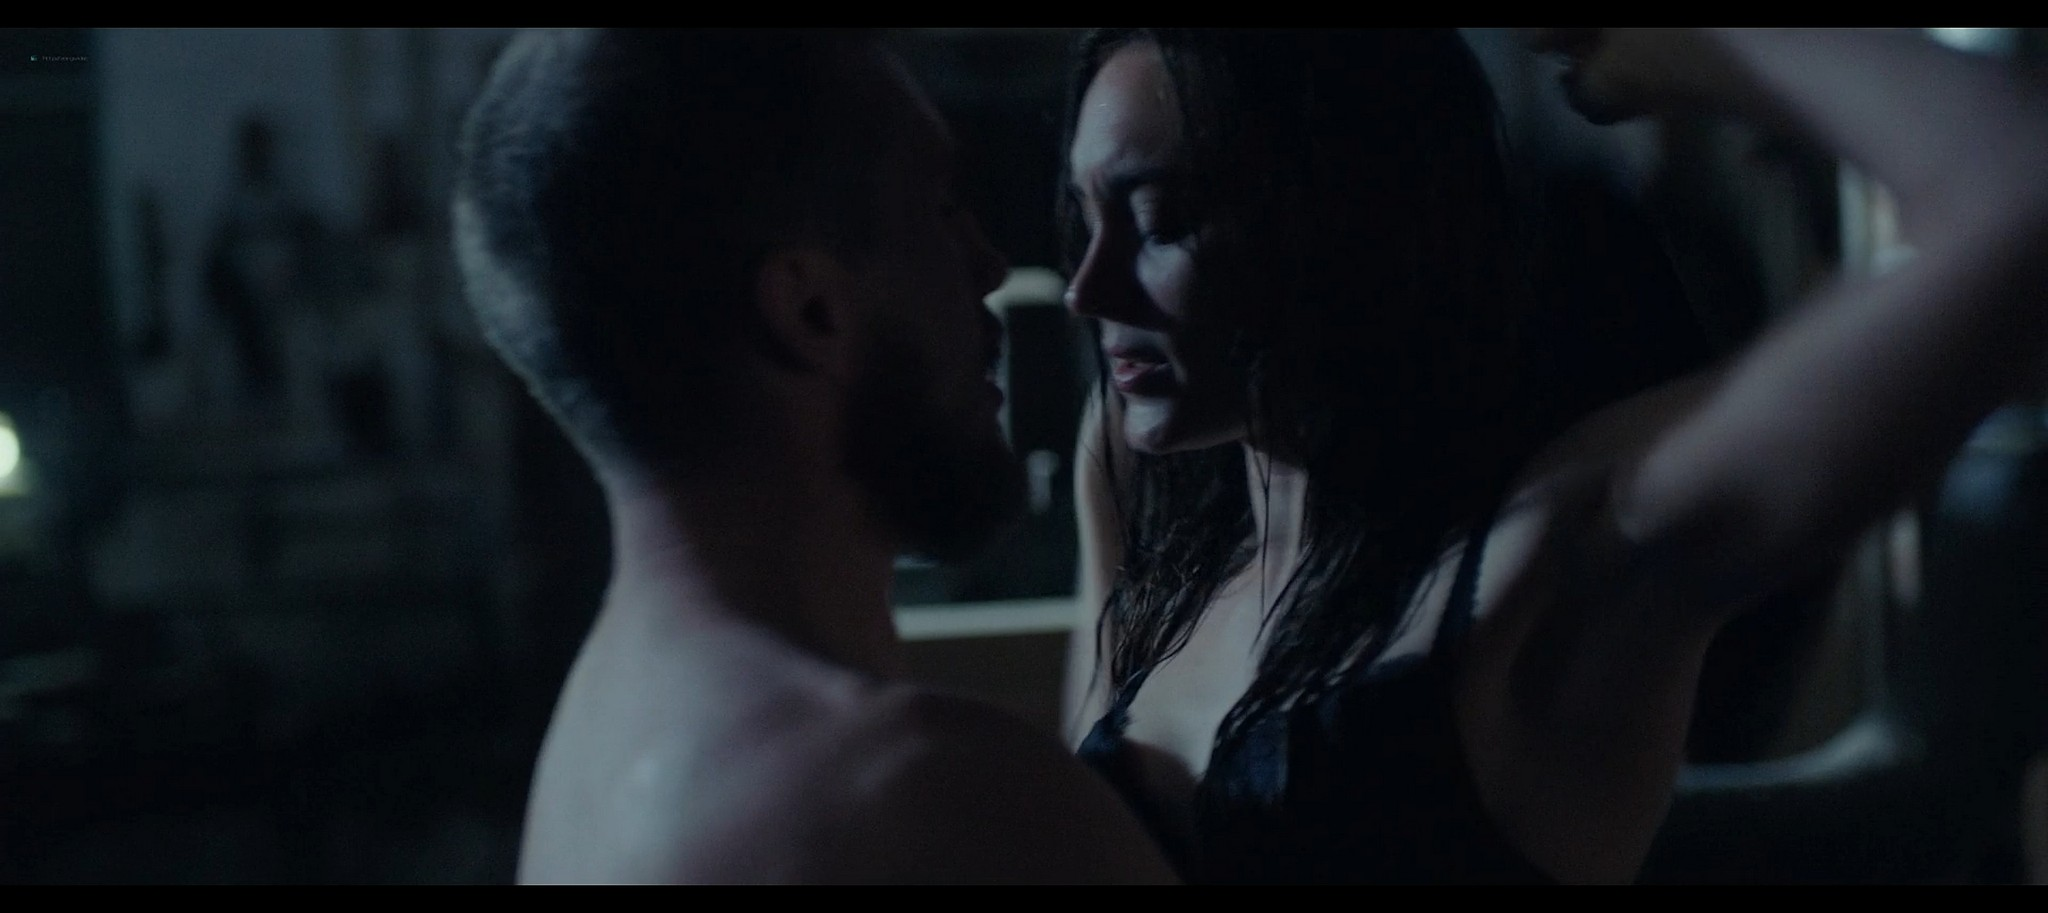 Julie Christiansen nude sex Marie Boda sexy While We Live DK 2017 1080p BluRay 6